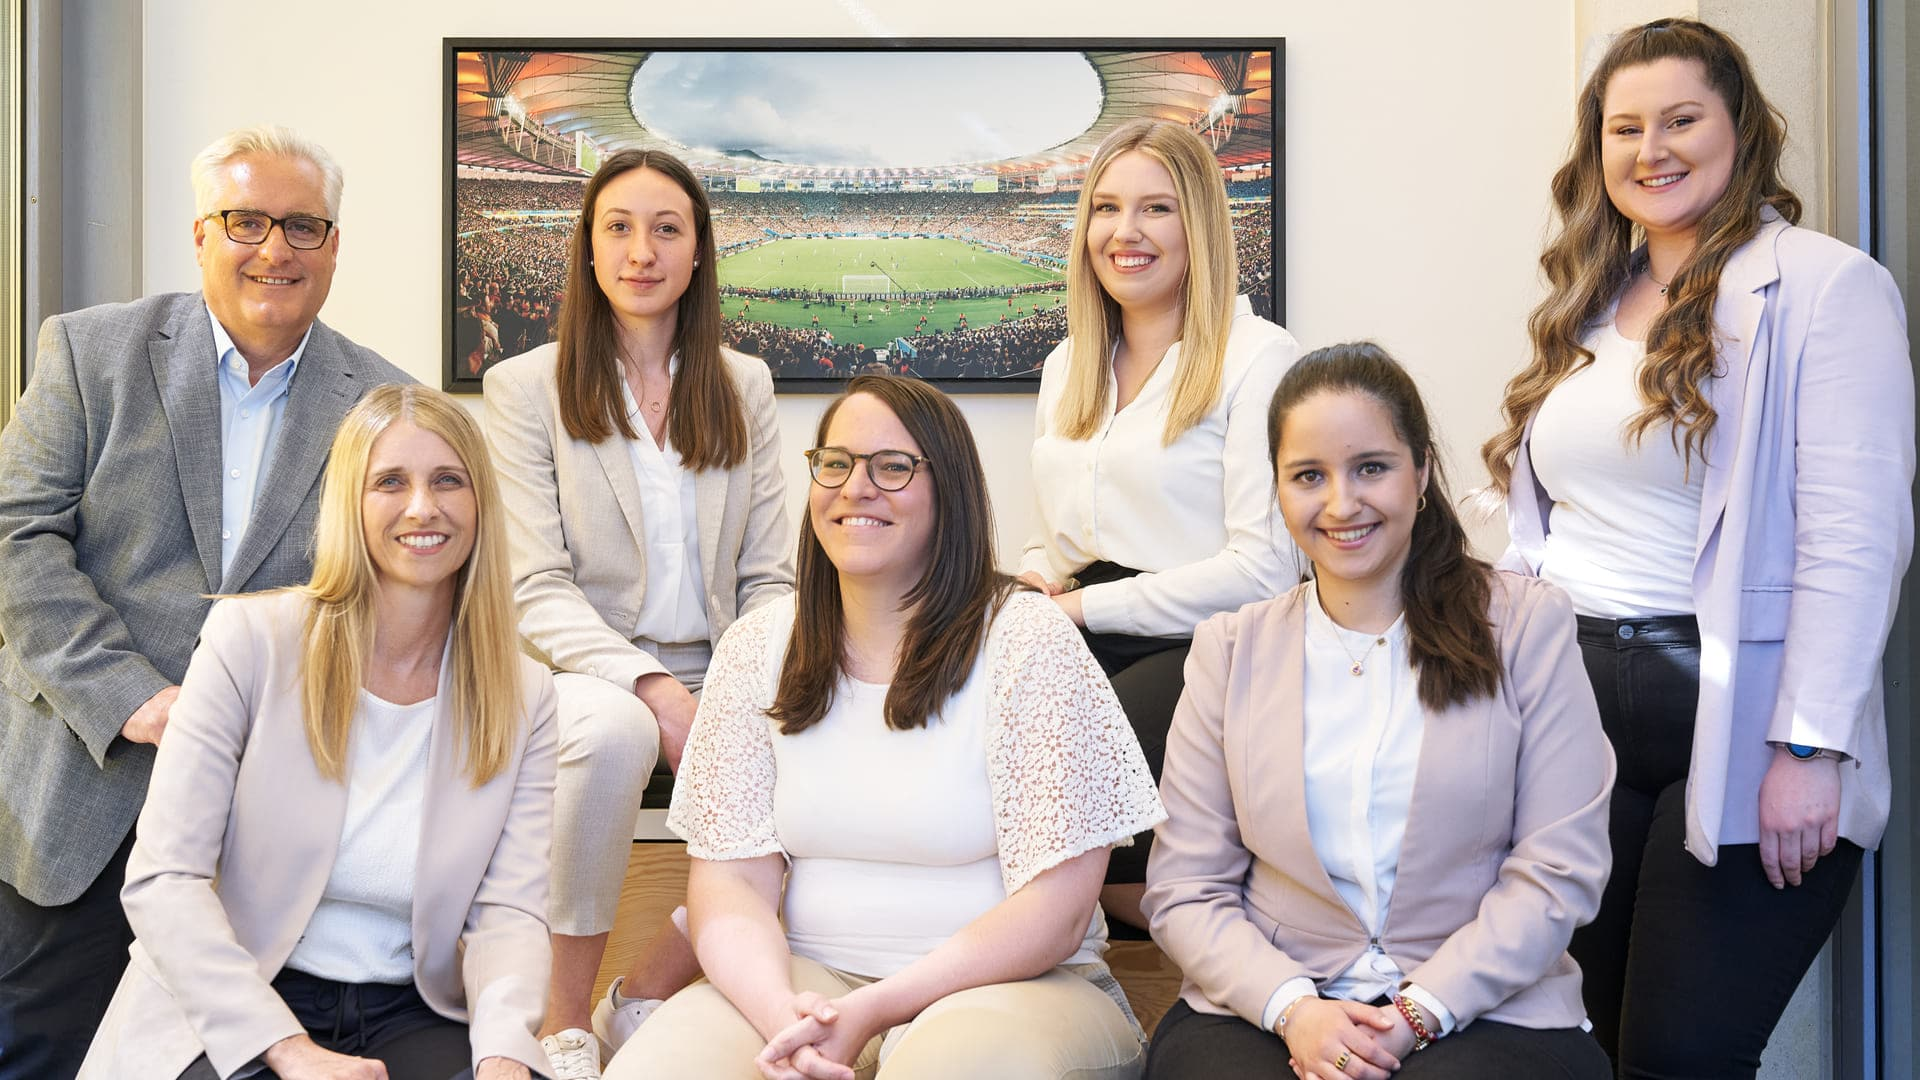 proJob Teamfoto aller Mitarbeiter im Office